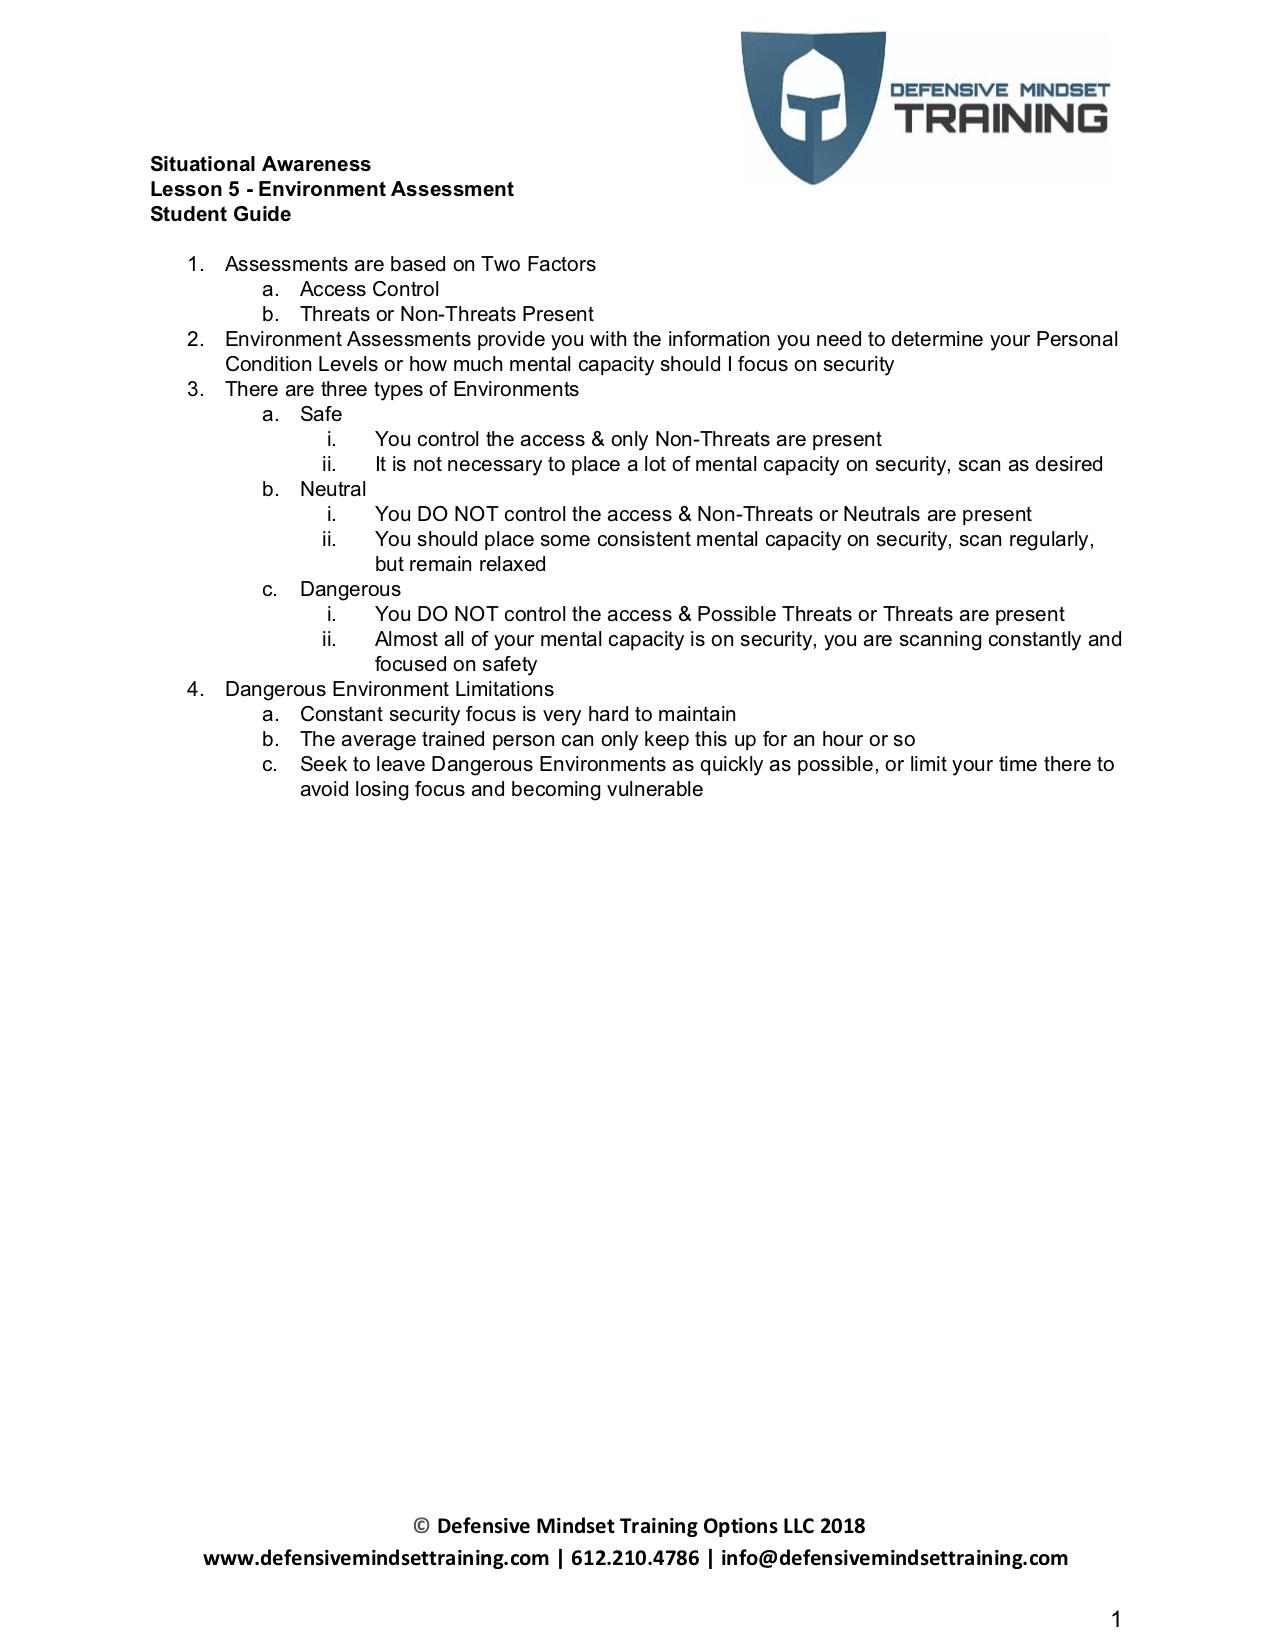 SA L5 - Environment Assessment - Student Guide.jpg